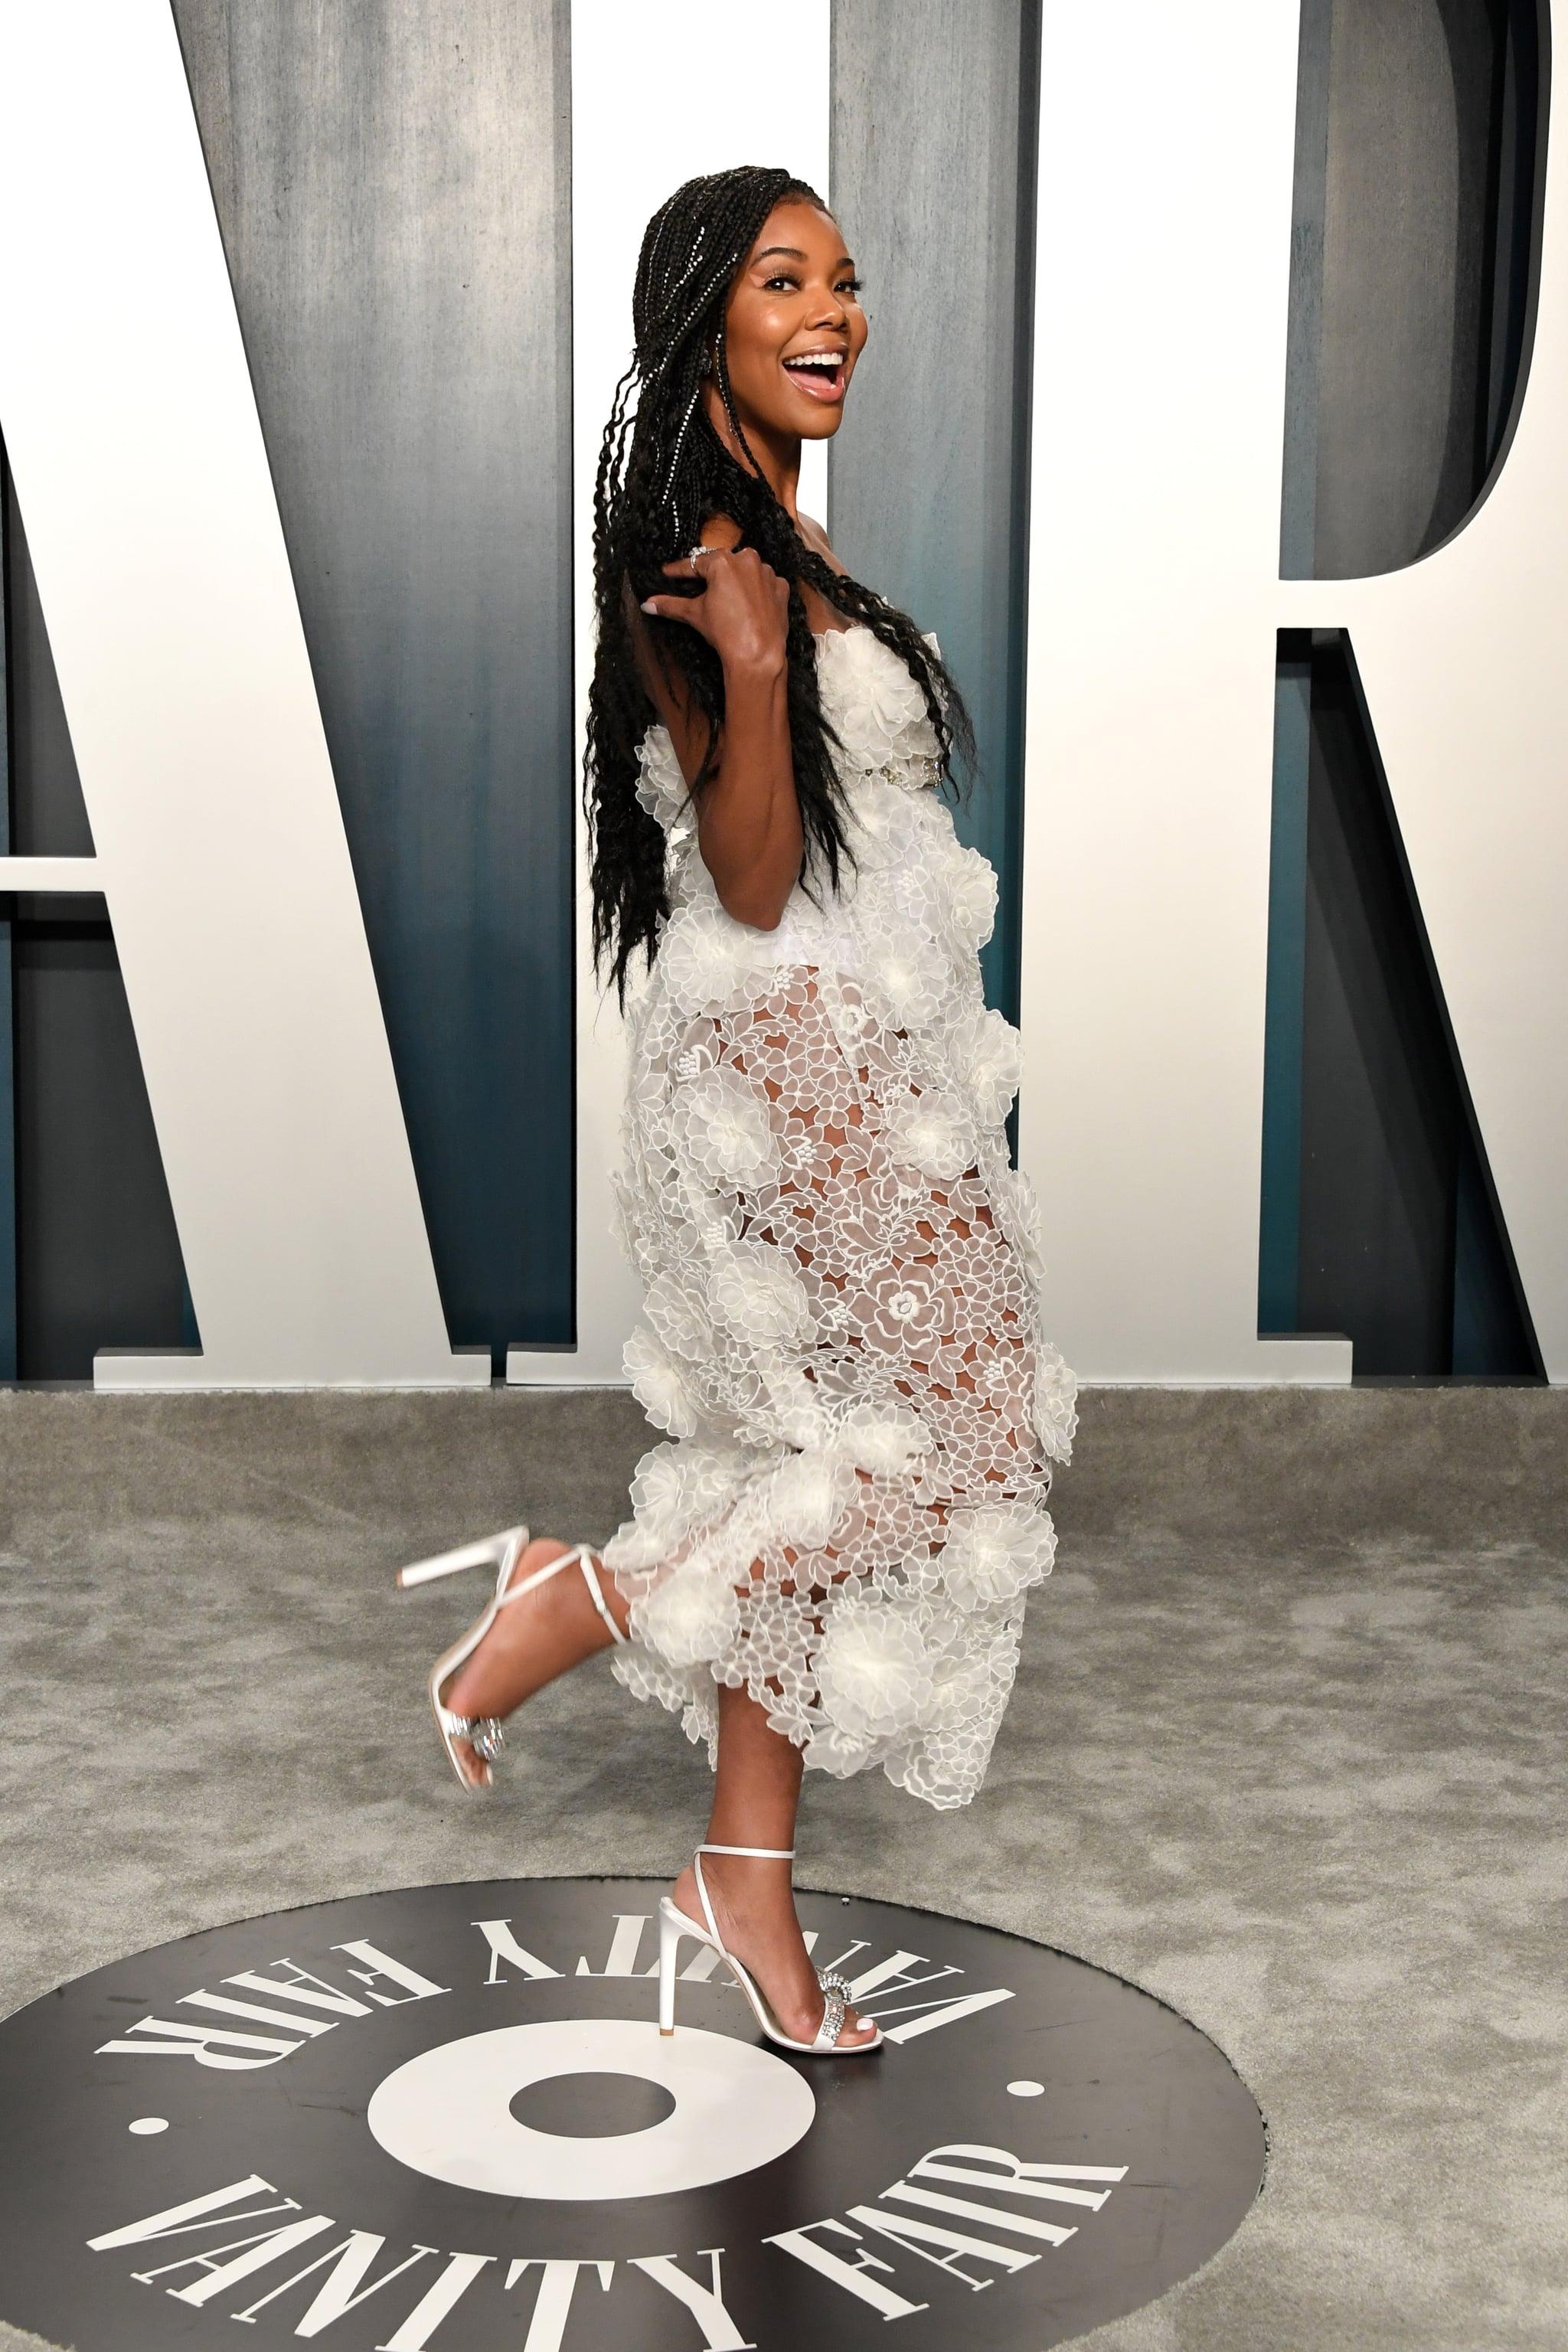 Best Vanity Fair Oscars Party Dresses 2020 Popsugar Fashion Middle East